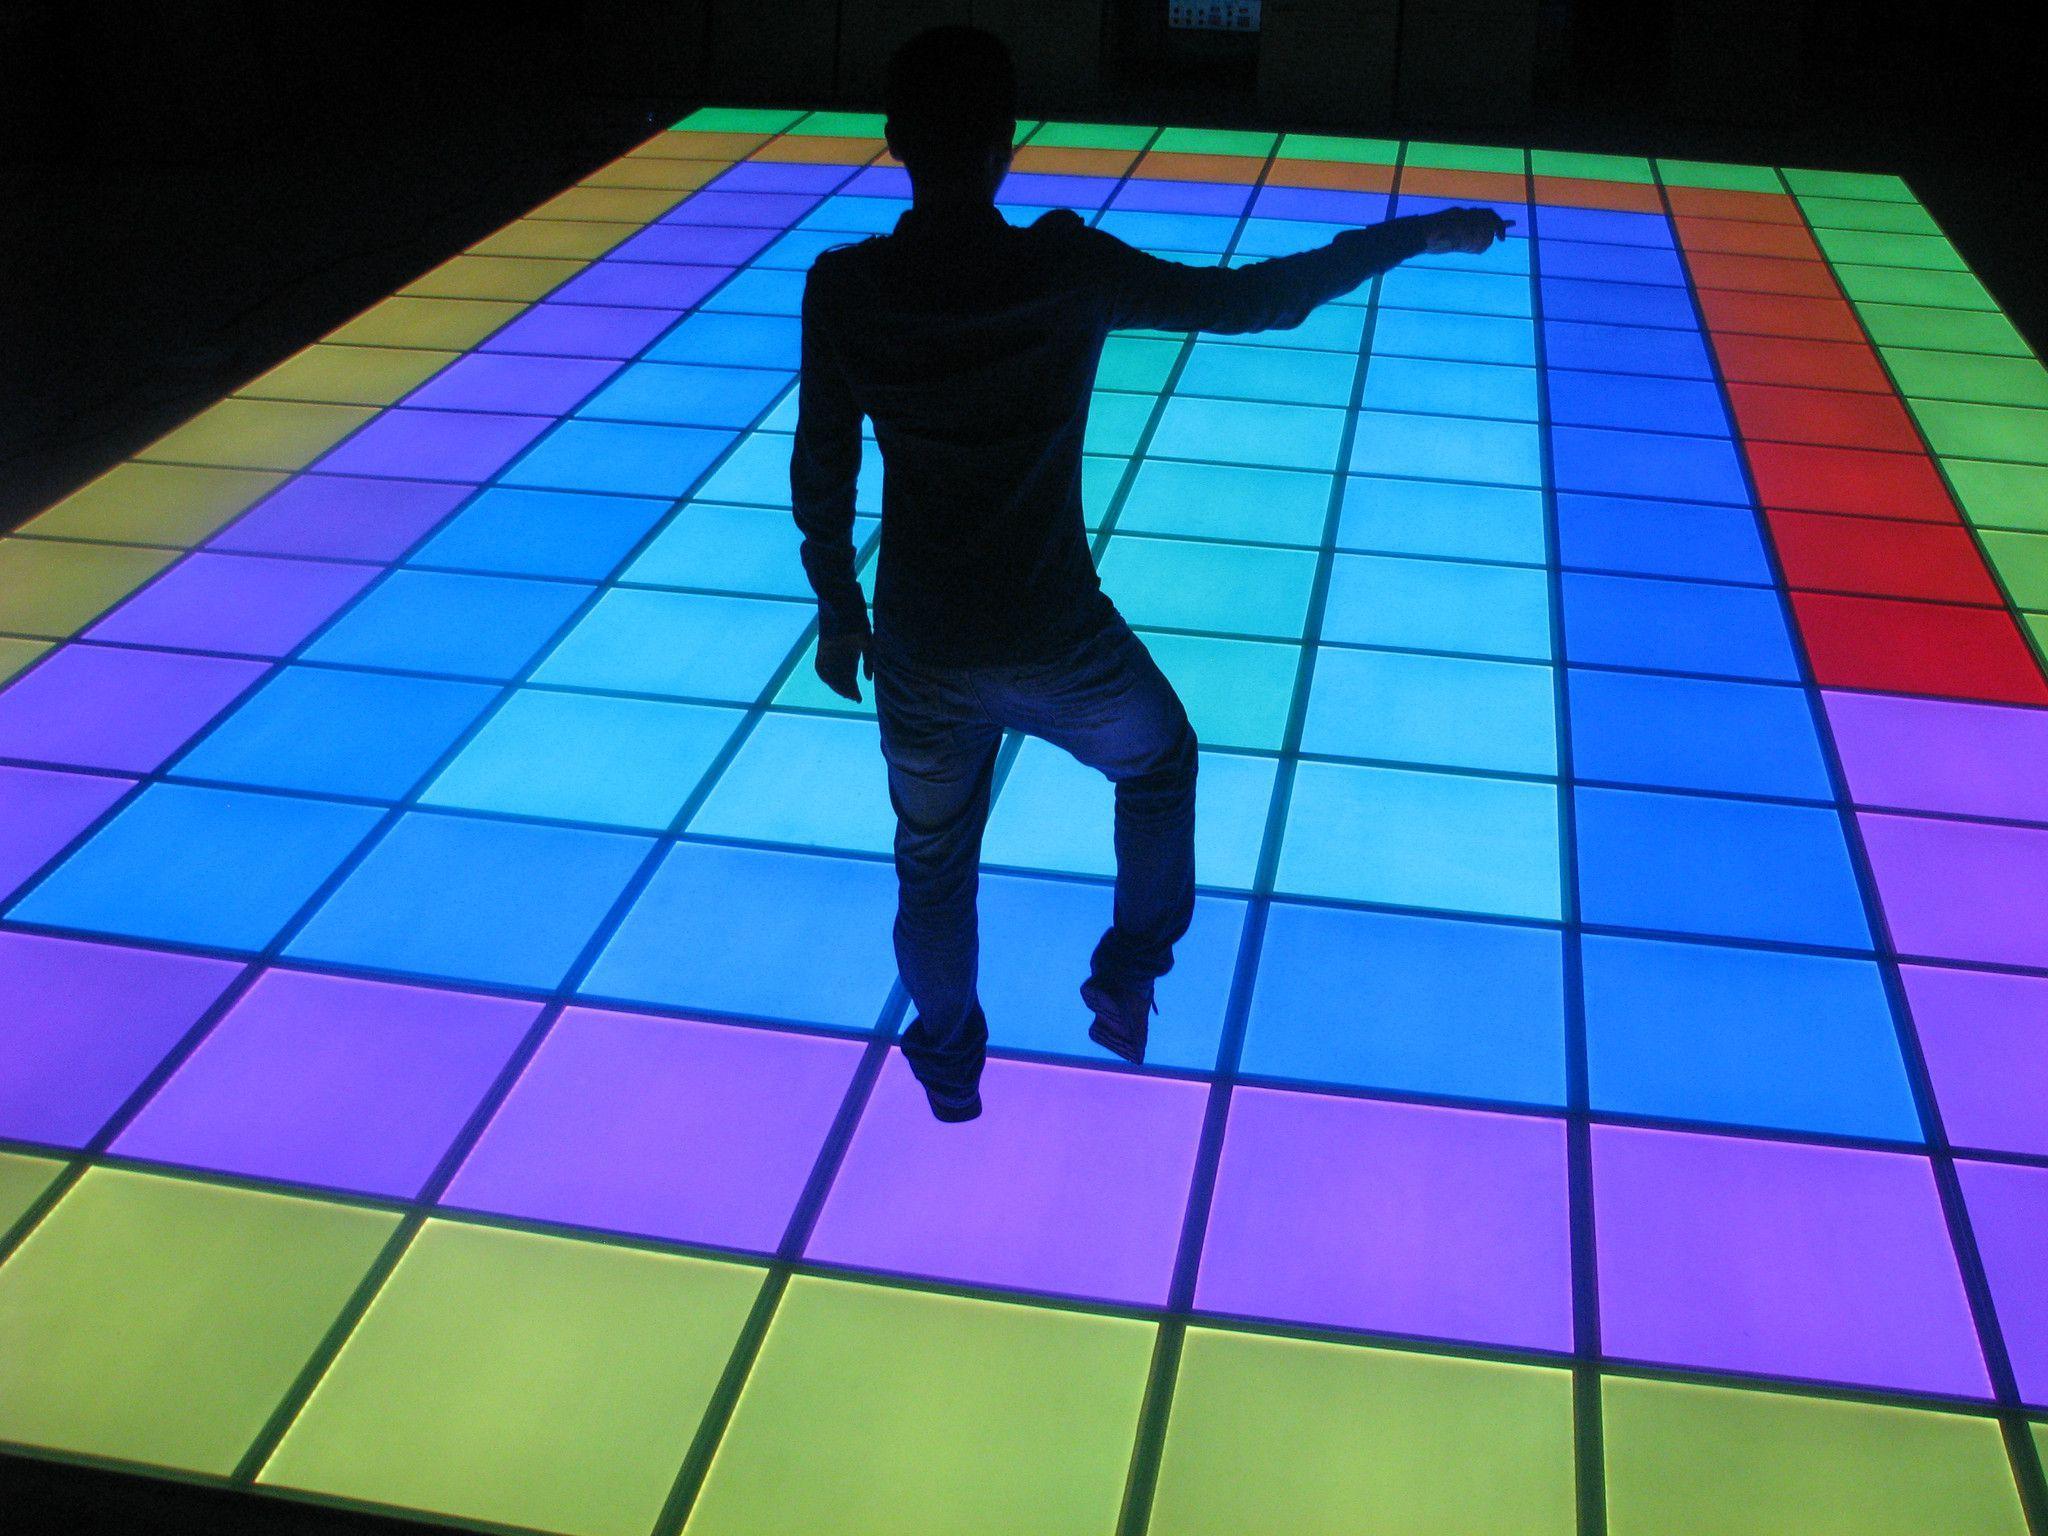 1 2 3 Rgb Full Color Changing Lighting Floor Tiles Panel Led Dance Dance Floor Lighting Flooring